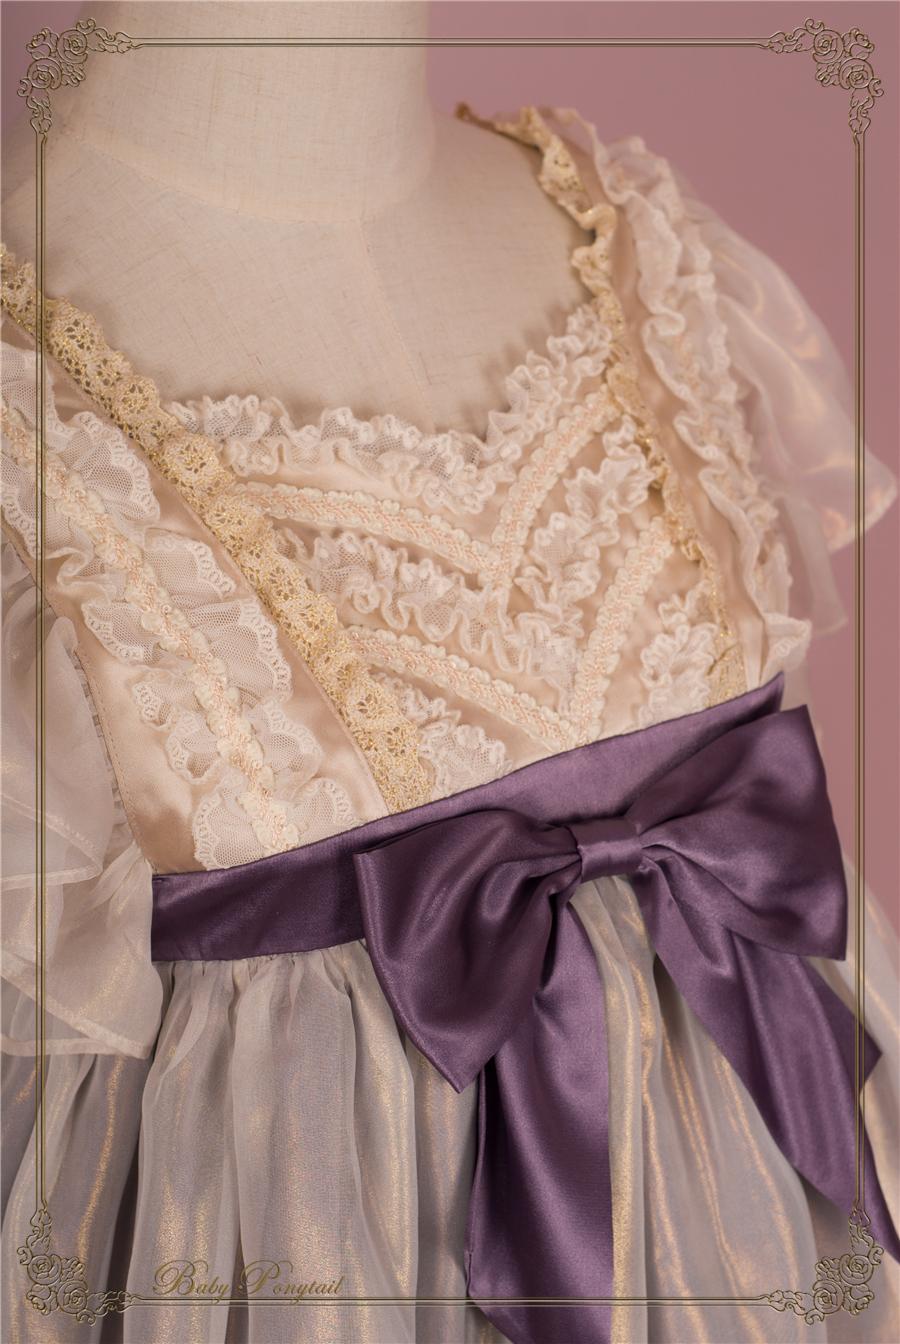 Babyponytail_Stock Photo_Present Angel_JSK Lavender_1.jpg